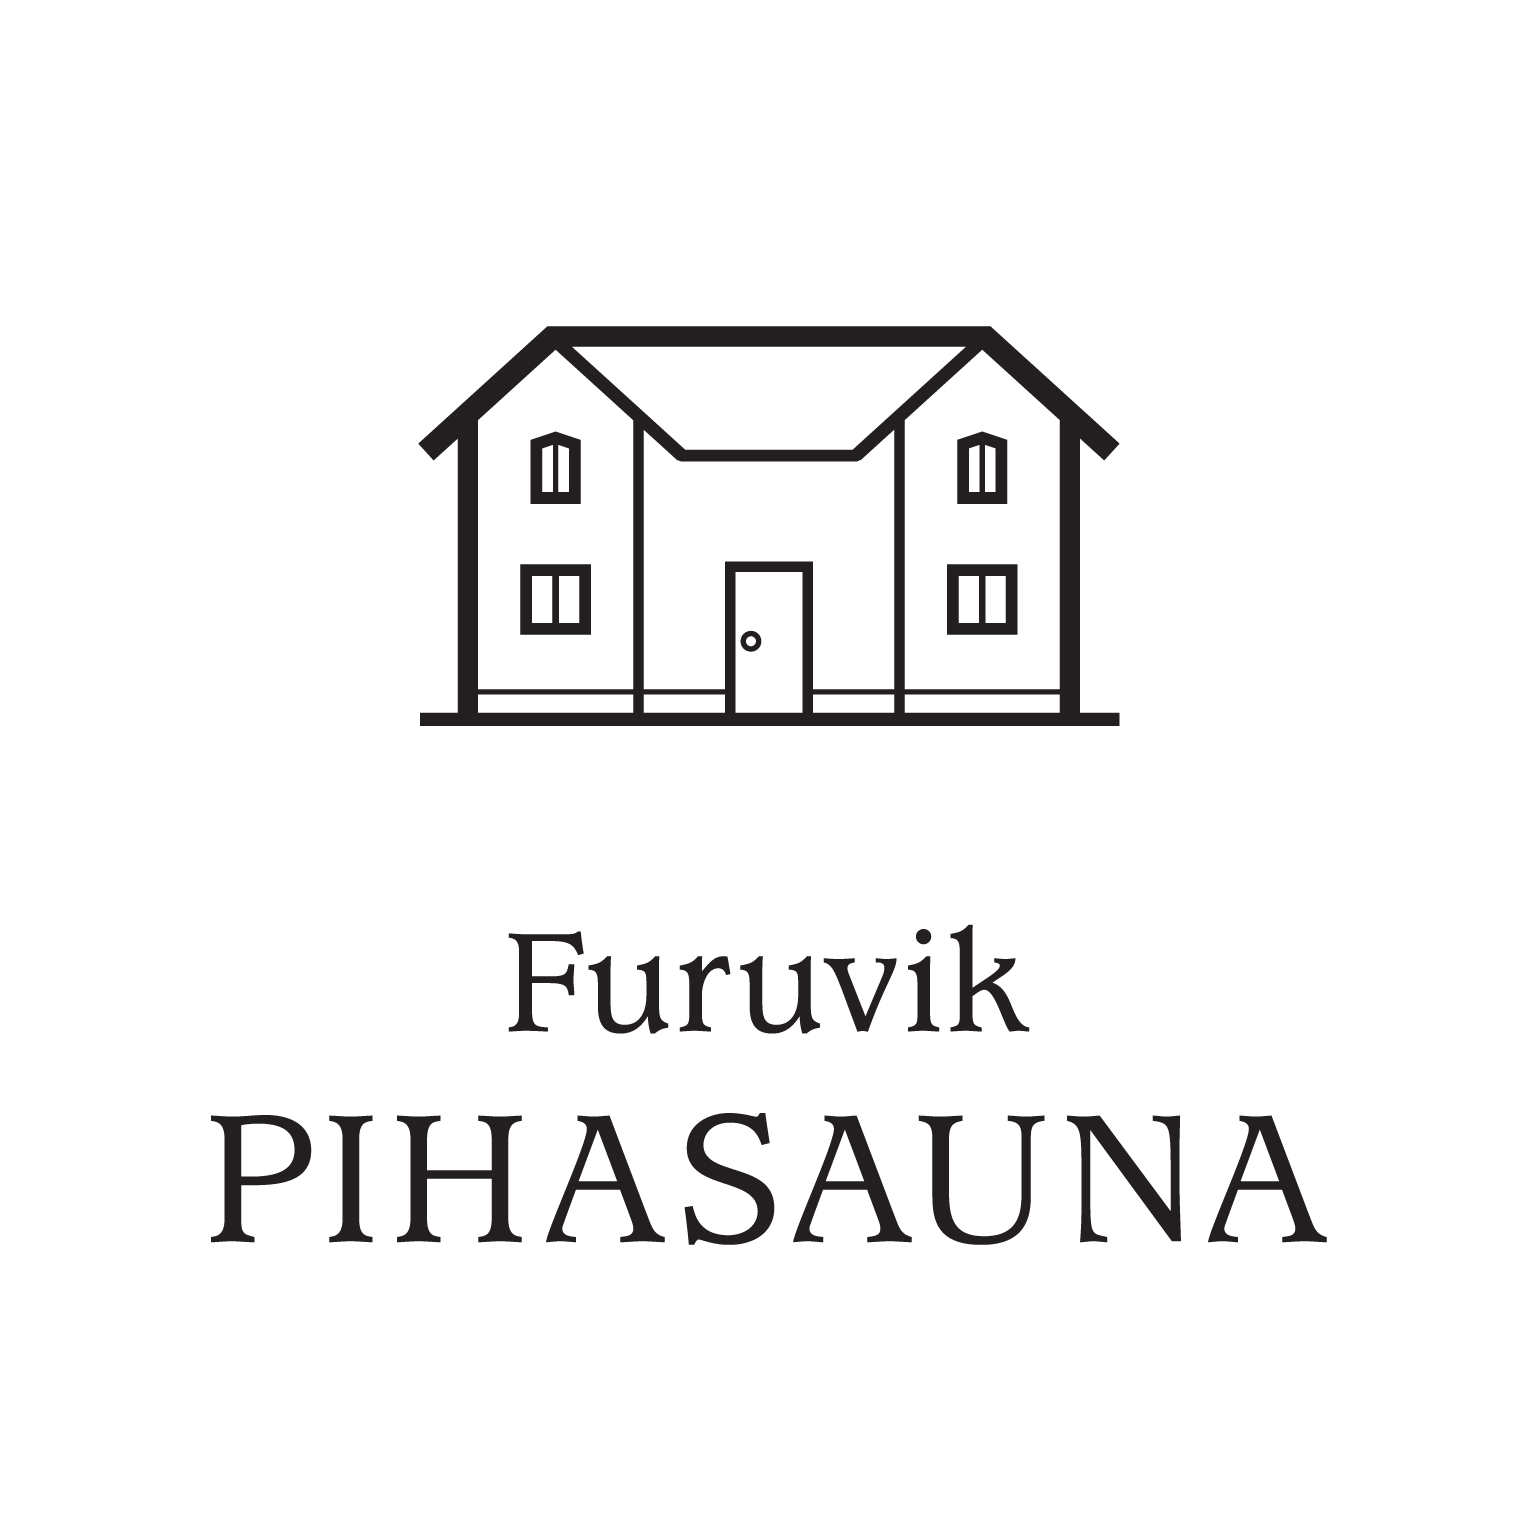 Villa Furuvik vuokratilat PIHASAUNA